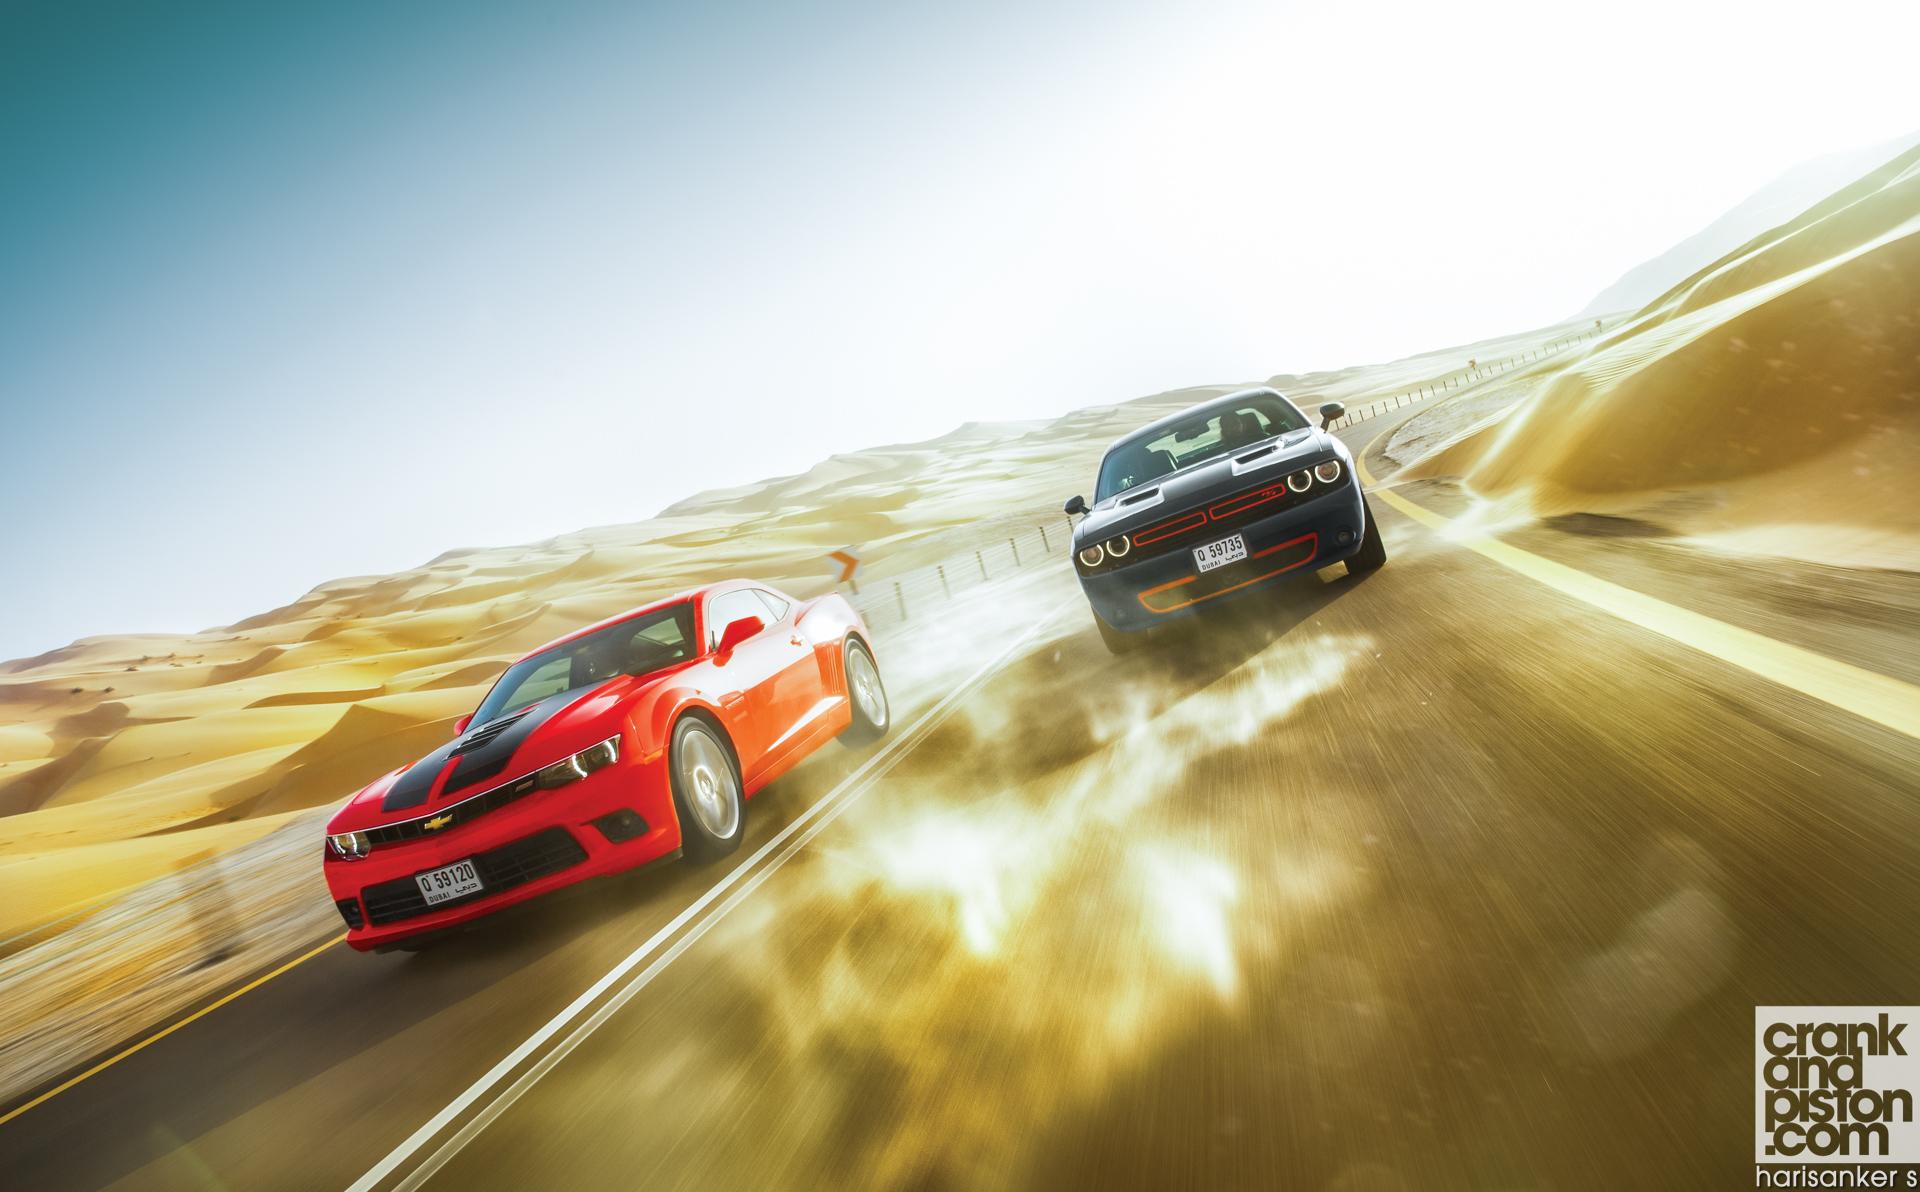 Ford-Mustang-v-Dodge-Challenger-R-T-v-Chevrolet-Camaro-SS-Wallpapers-3